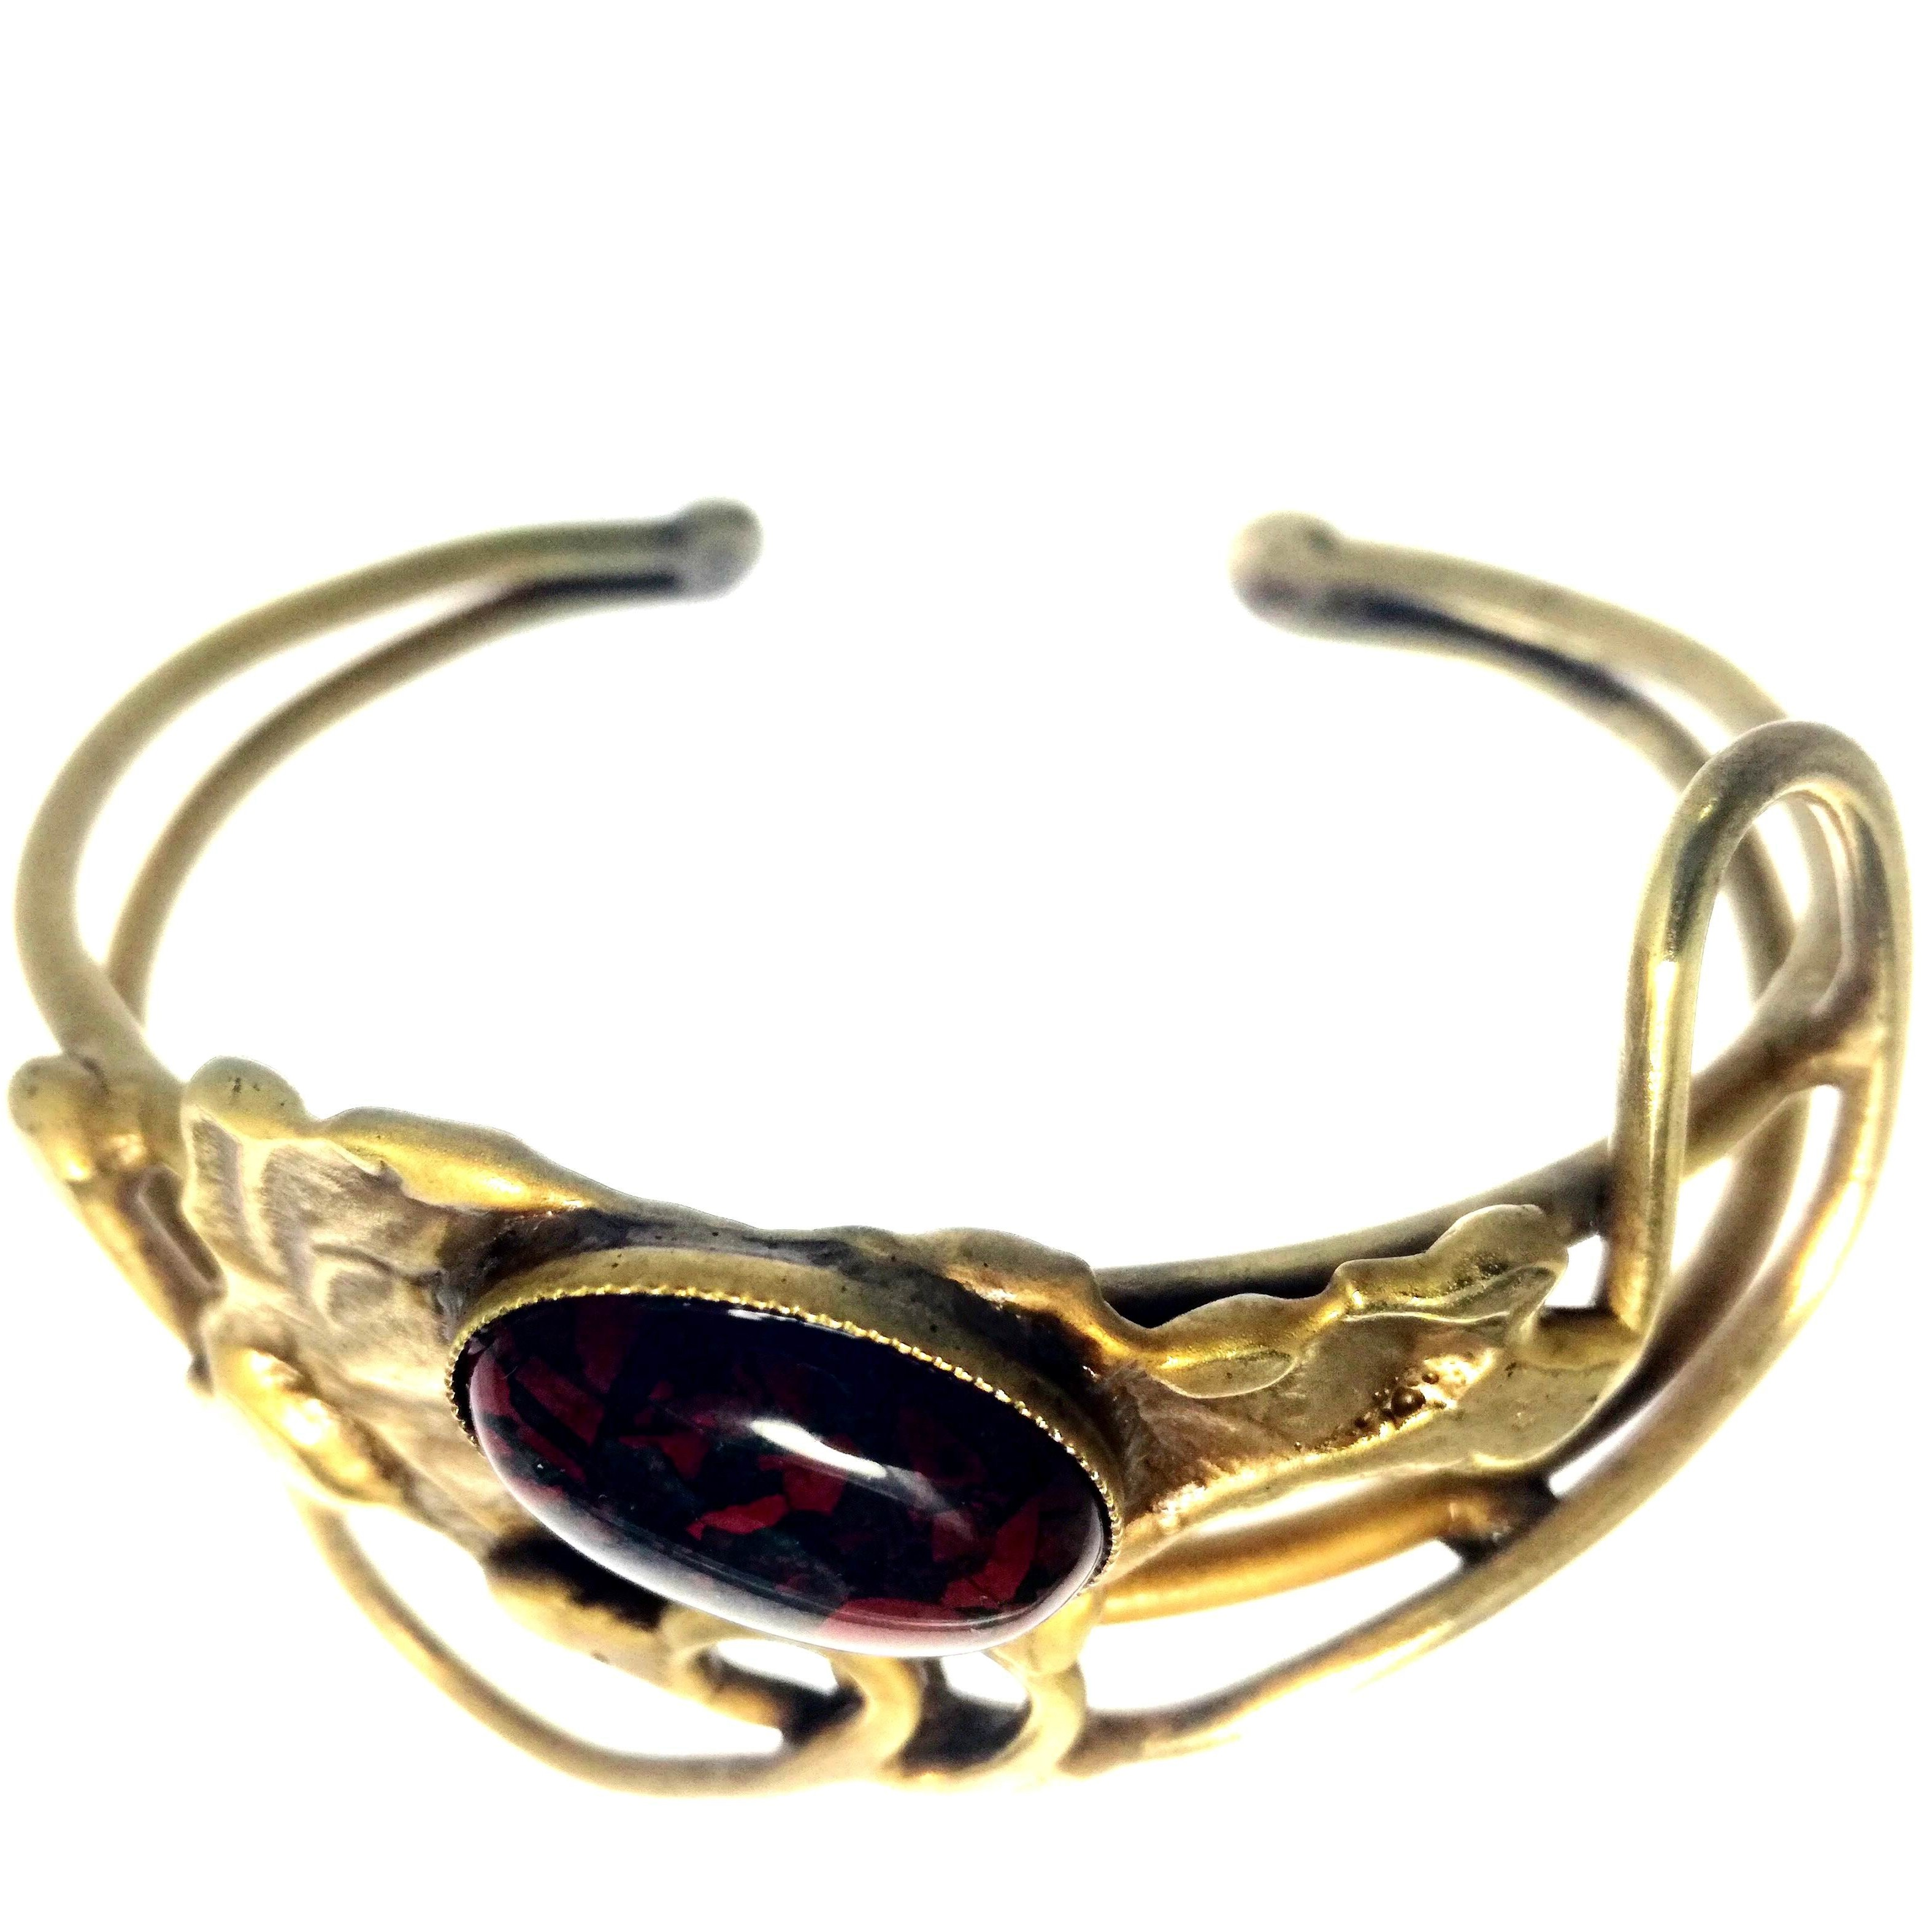 a5dfb7680a5 Bijou artisanal-bracelet bronze avec pierre véritable - Bijoux artisanaux-Création  Pik